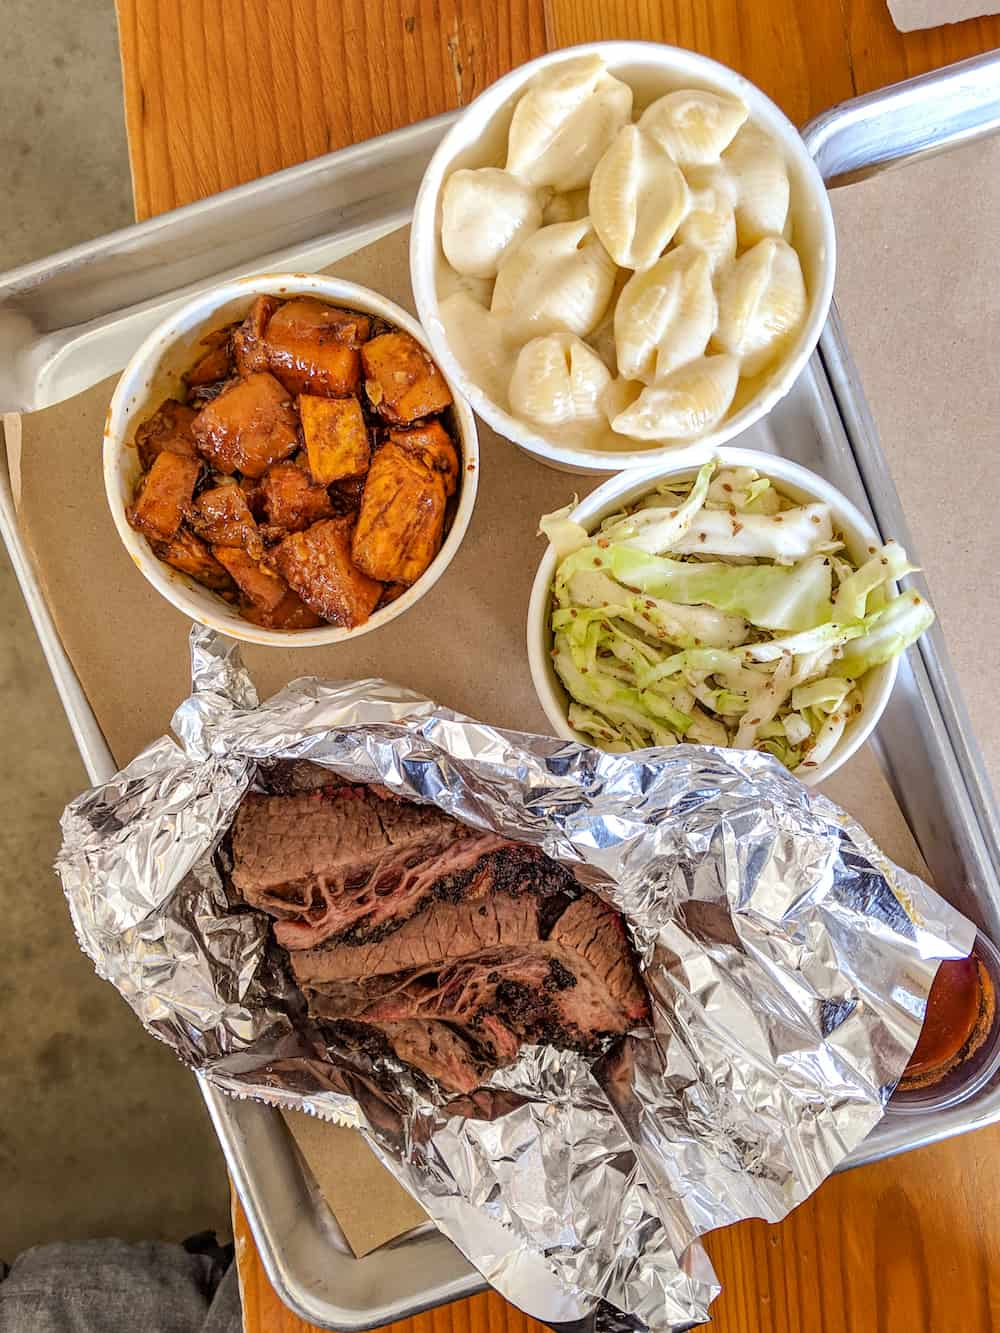 A-OK BBQ brisket, slaw, mac and cheese, and sweet potatoes